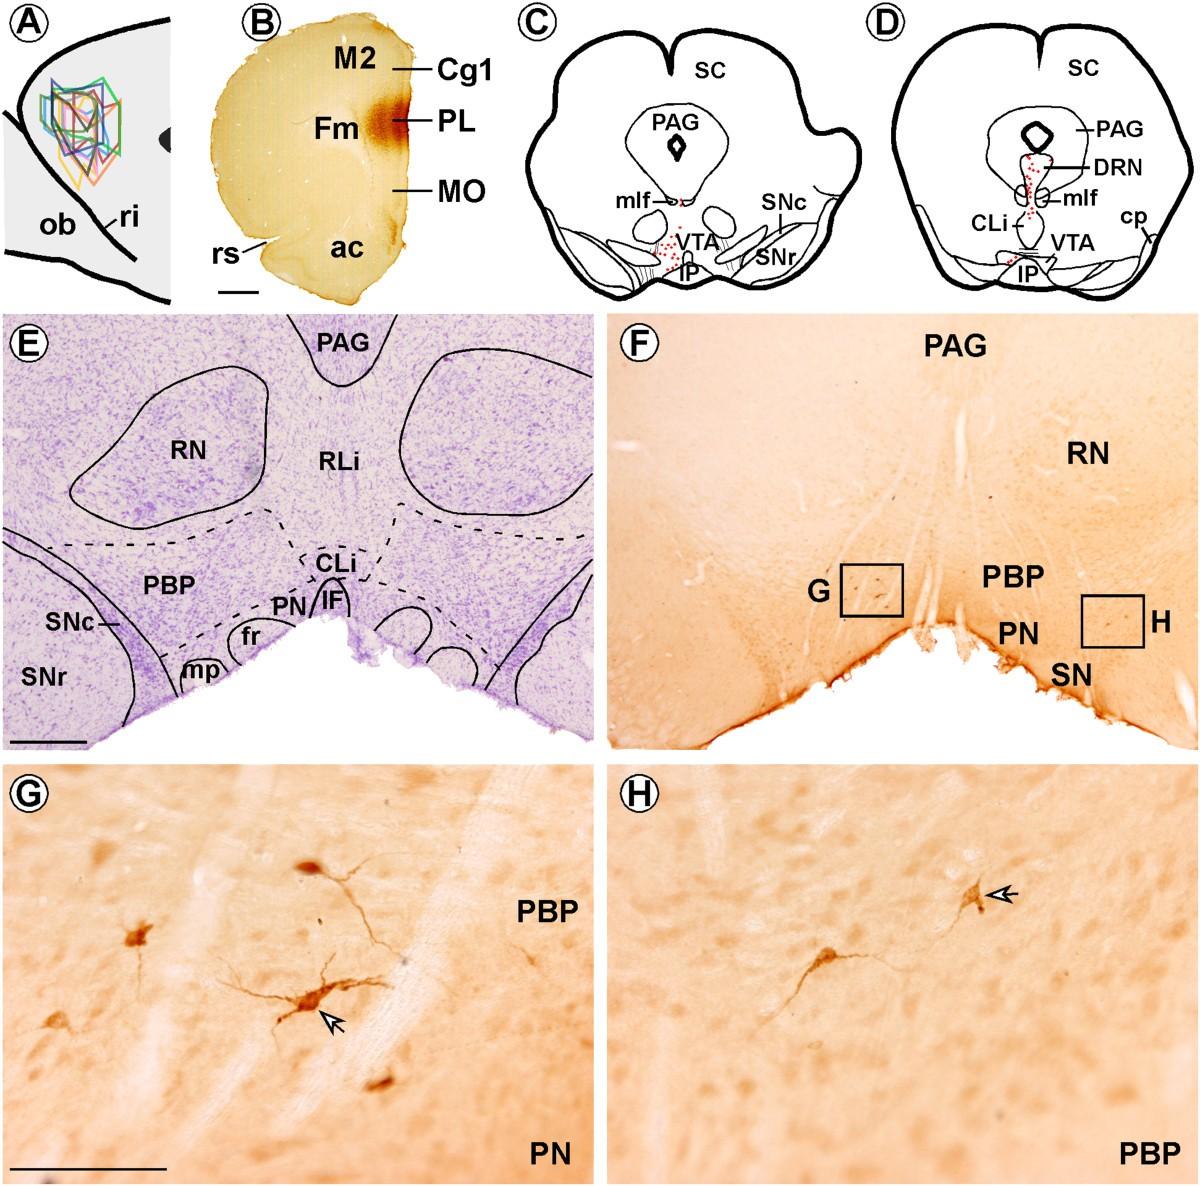 Hypocretin1/orexinA-immunoreactive Axons Form Few Synaptic